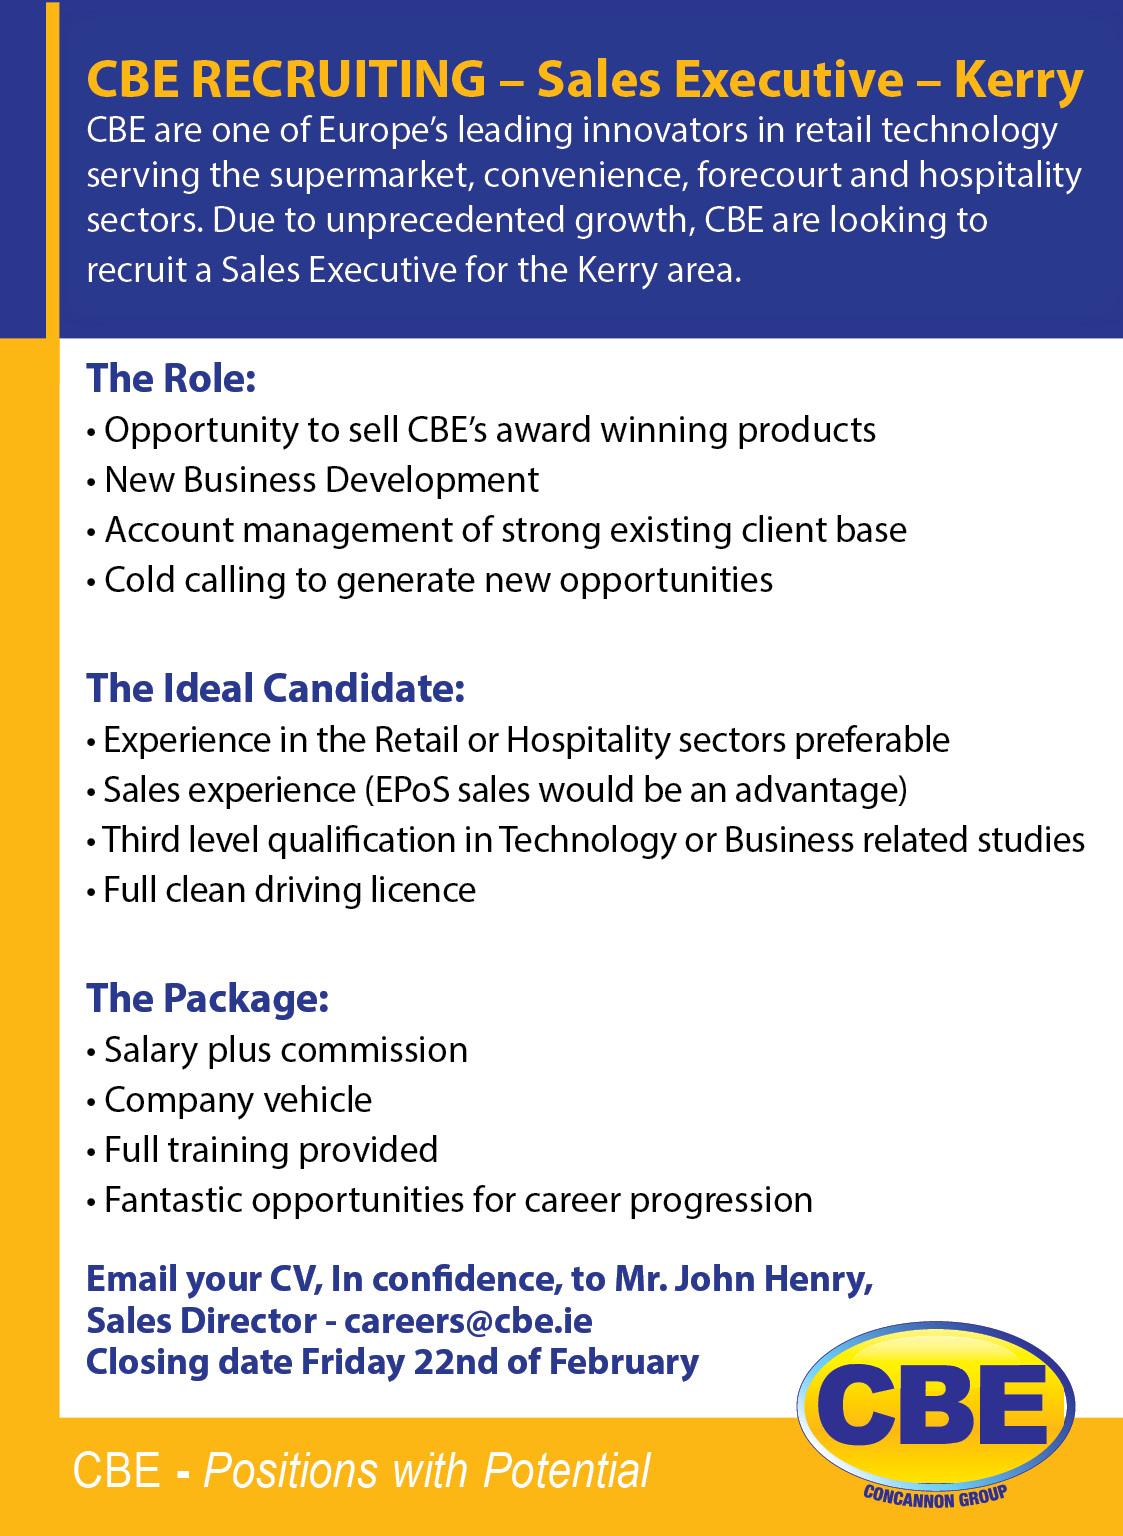 Michelle Kilcar specialist recruitment consultant in Ireland